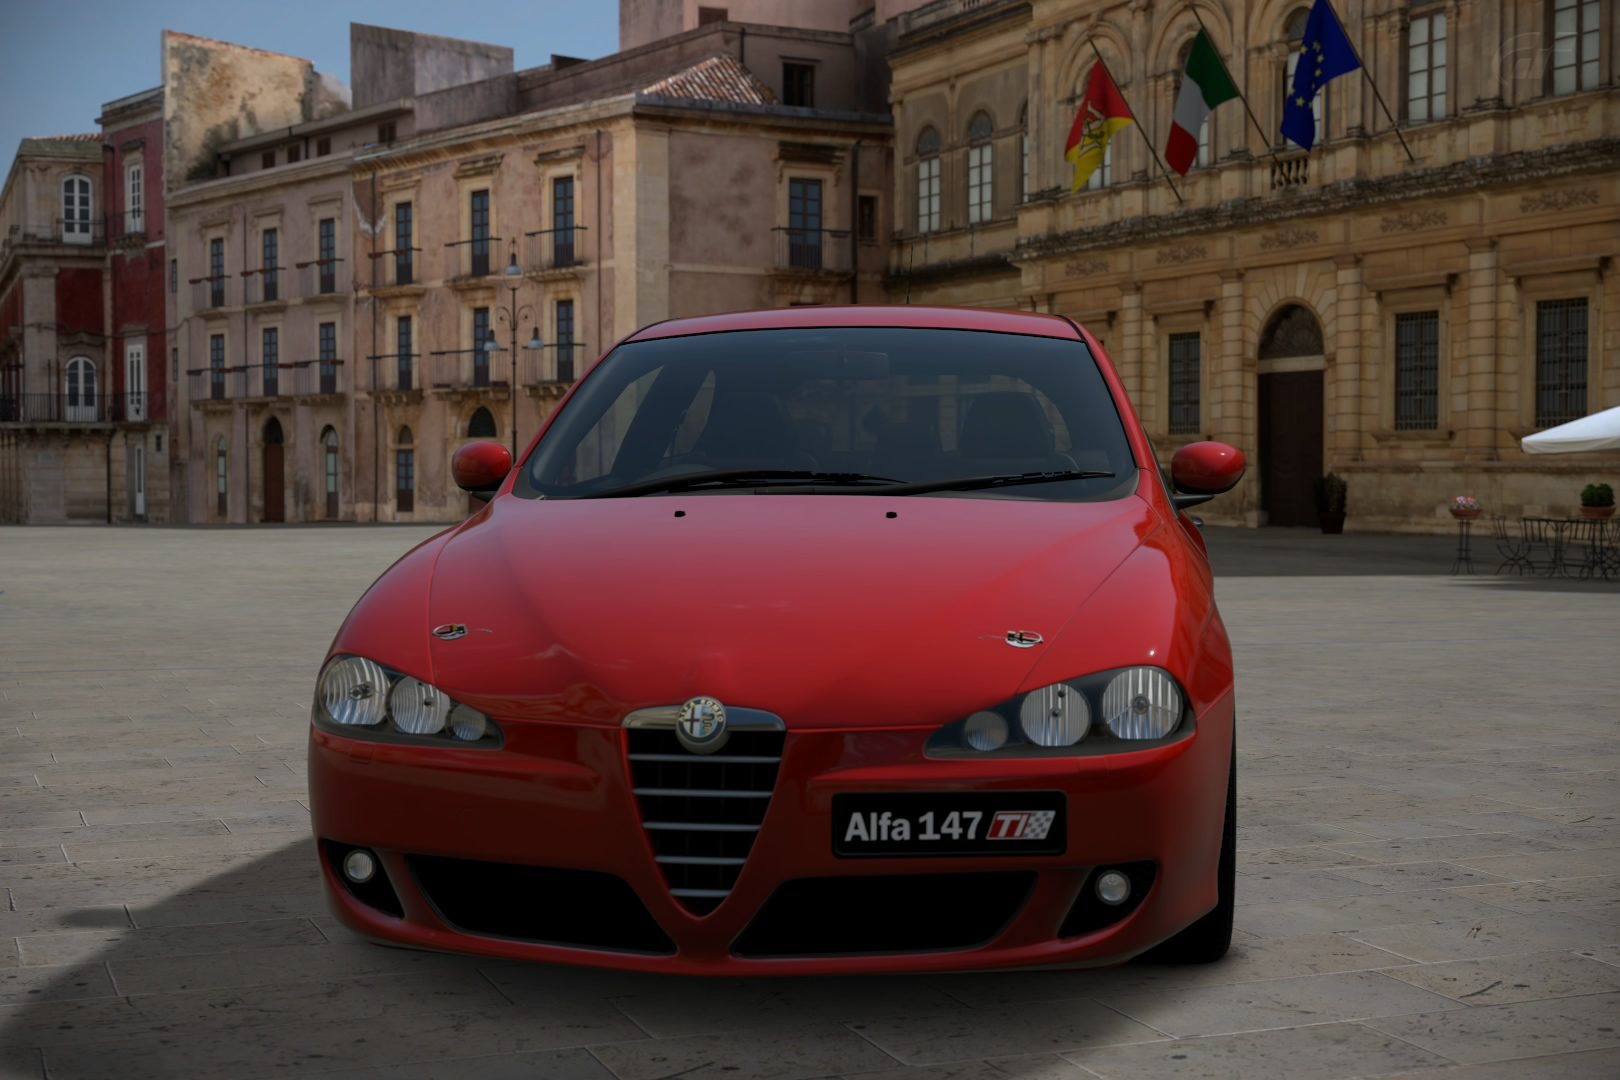 Alfa147'06.jpg